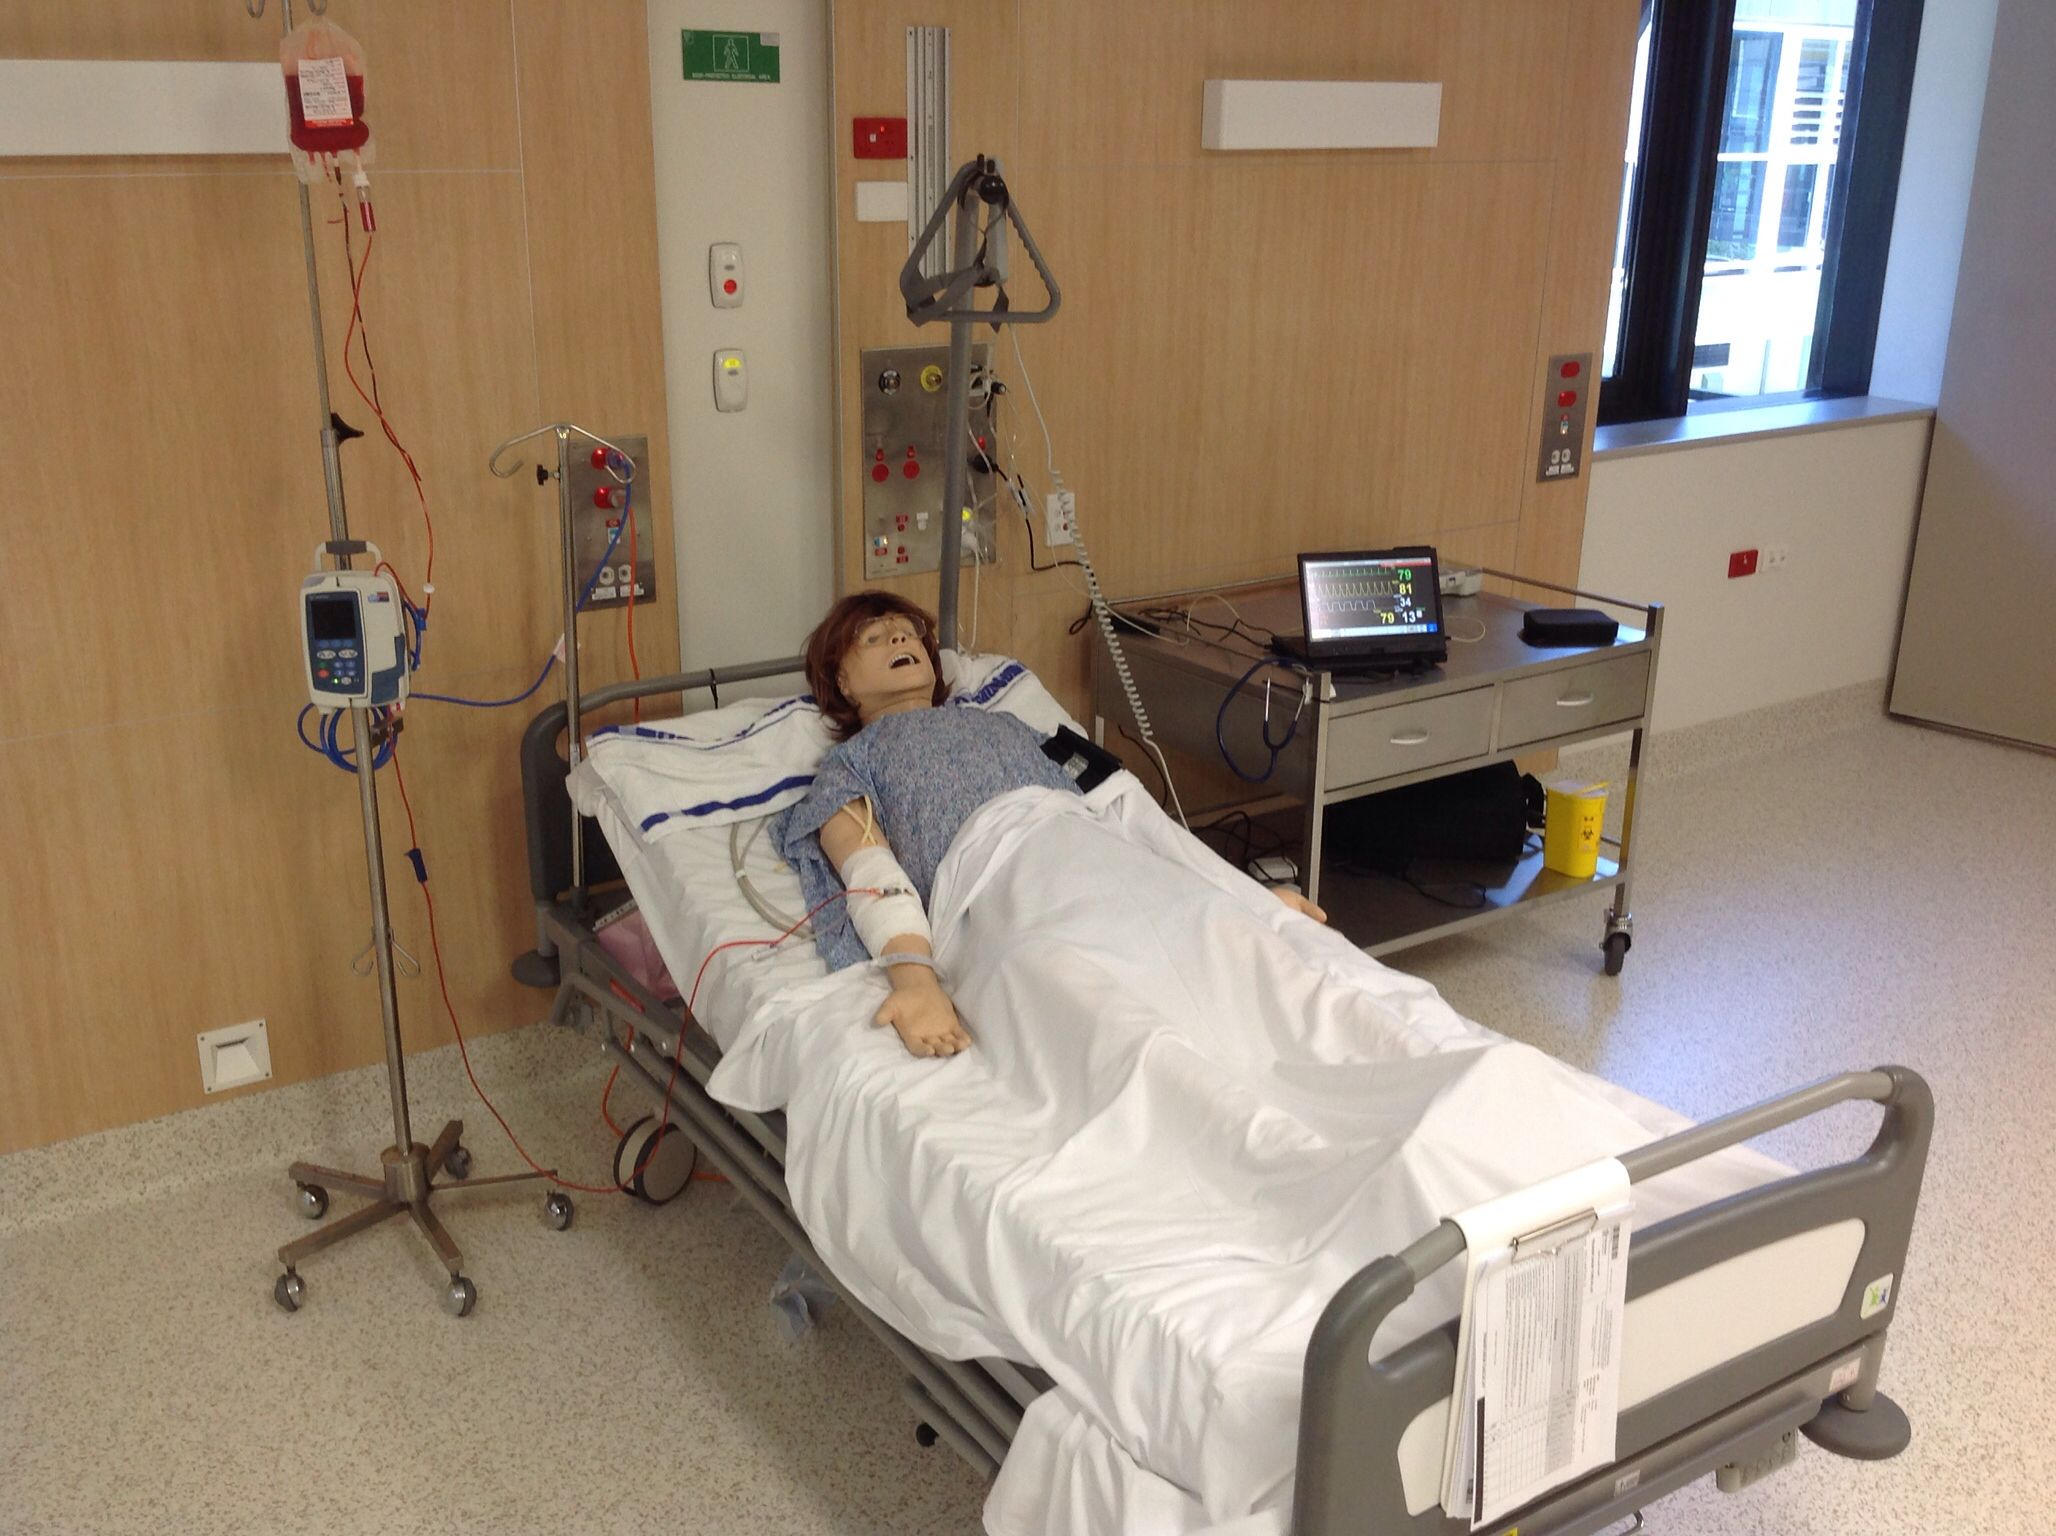 Blood transfusion running through an Alaris pump. Patients